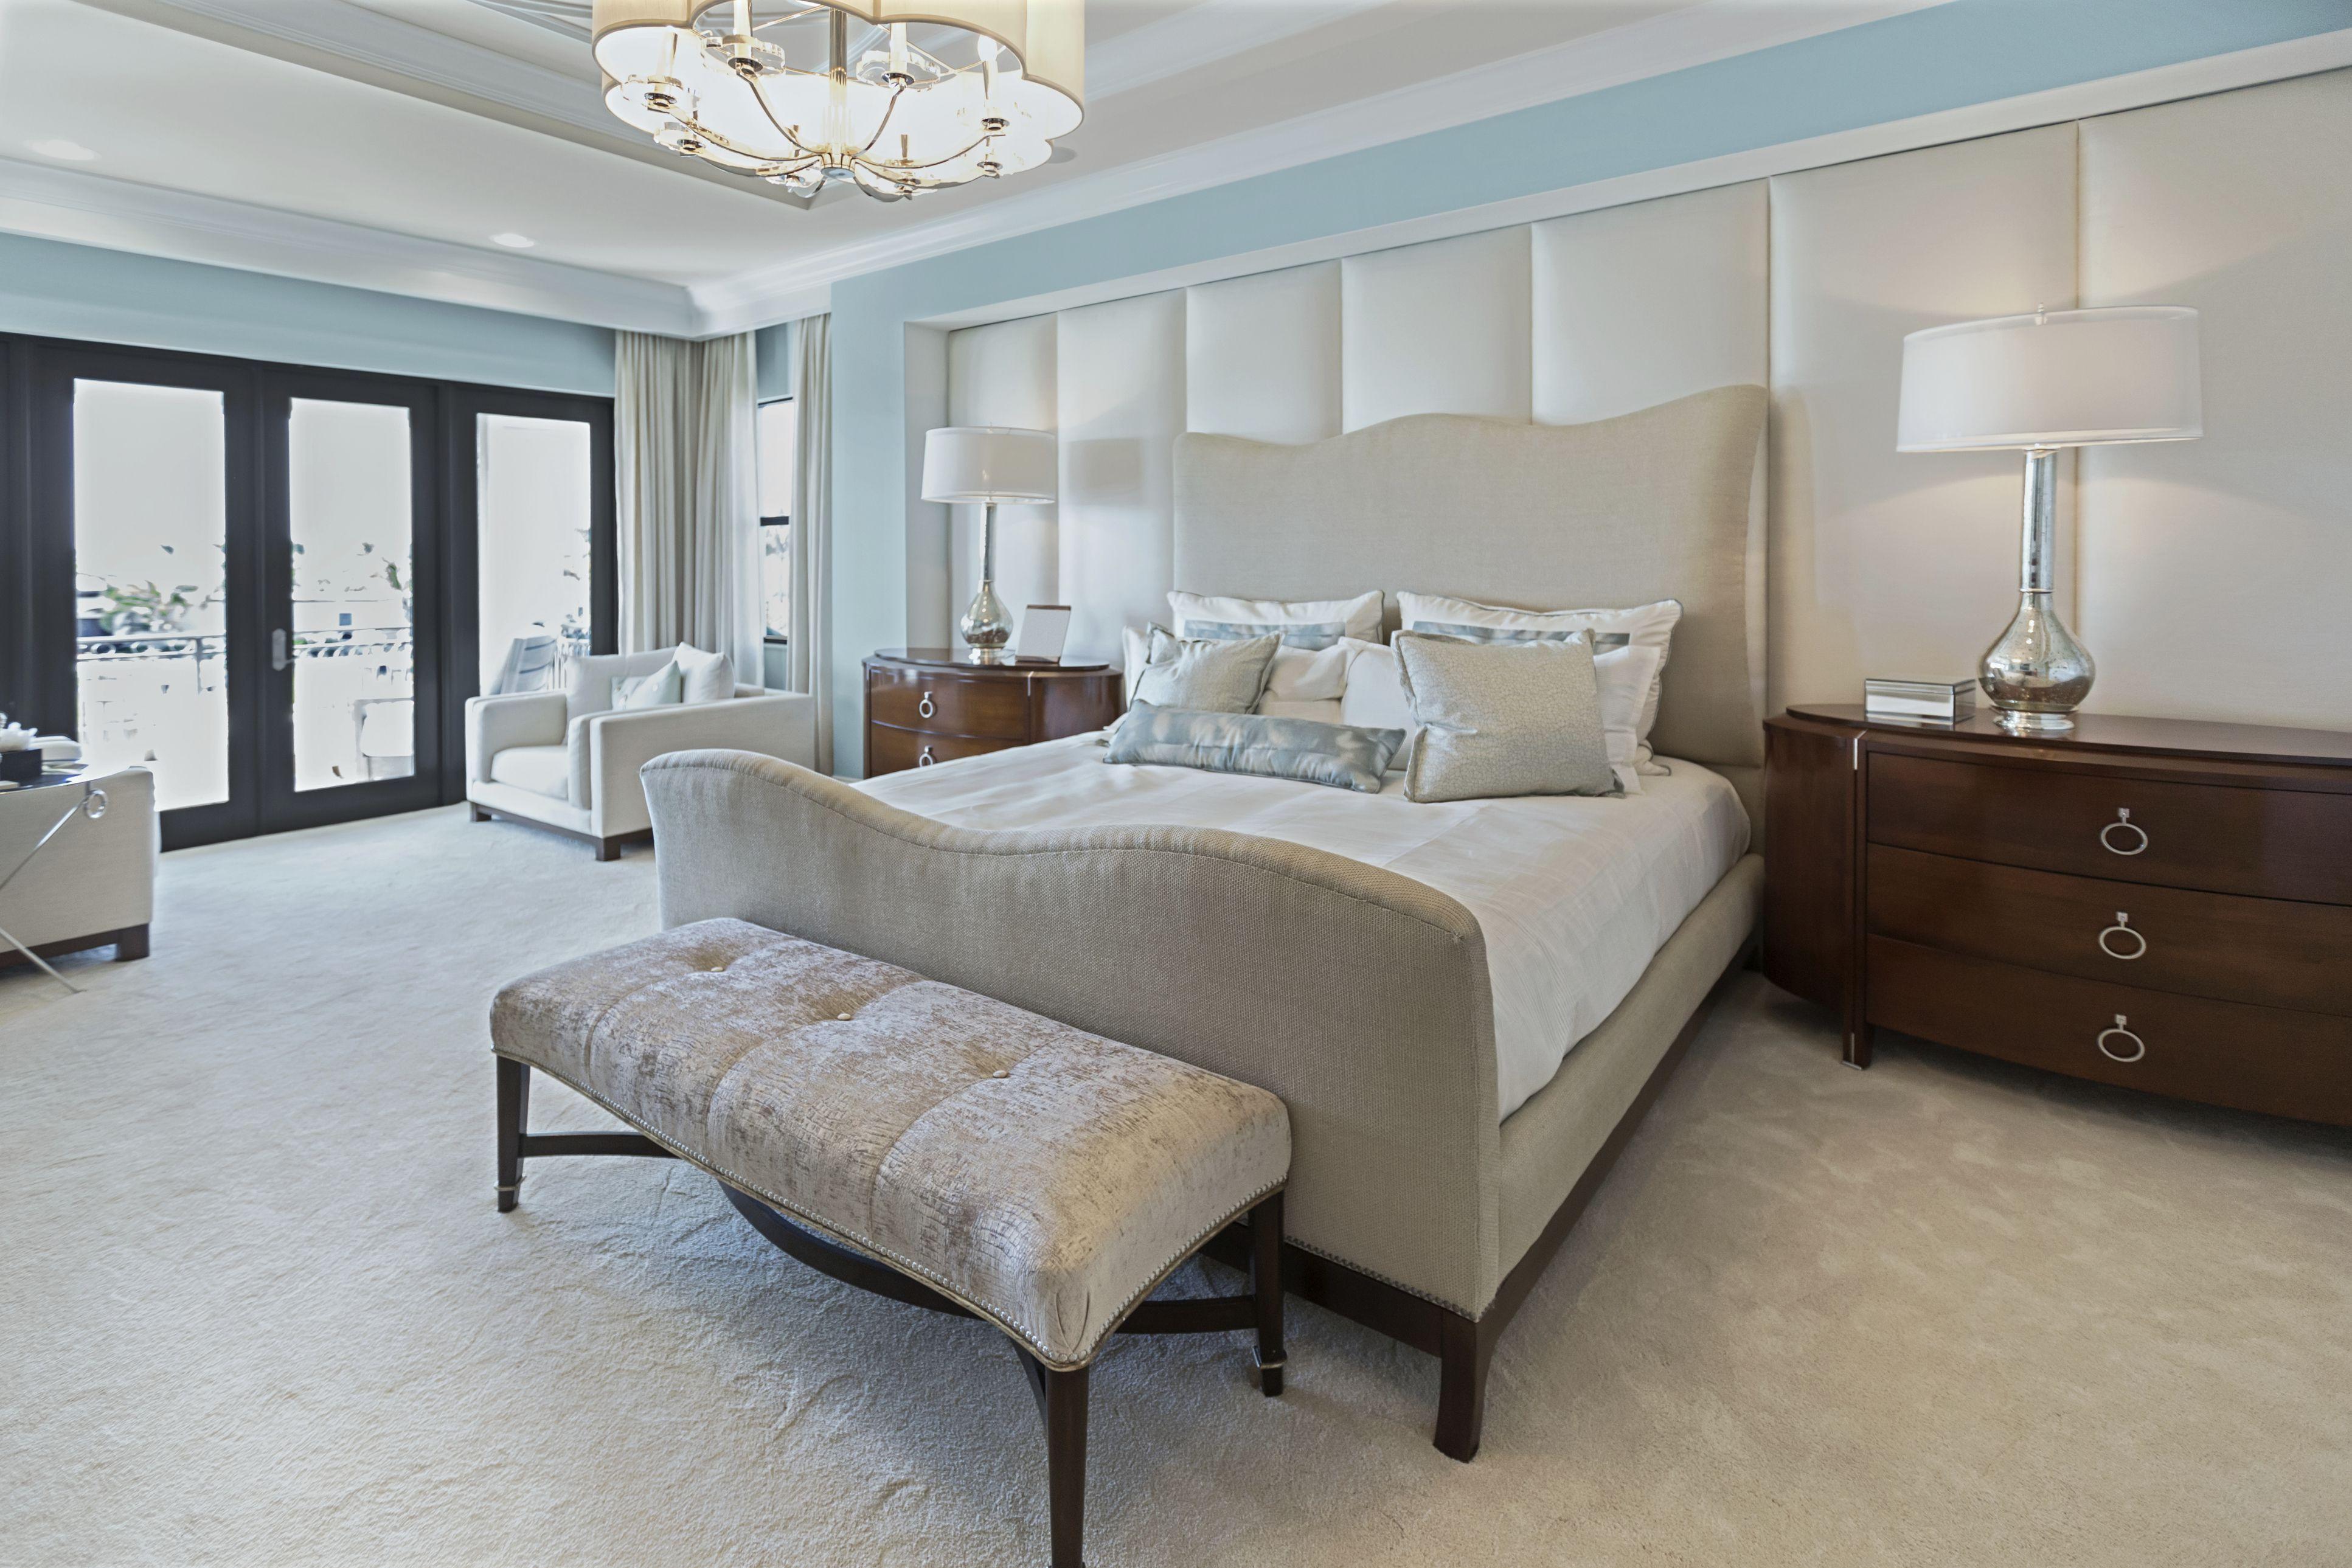 13 Best Carpet Ideas for 2020 Bedroom carpet, Best